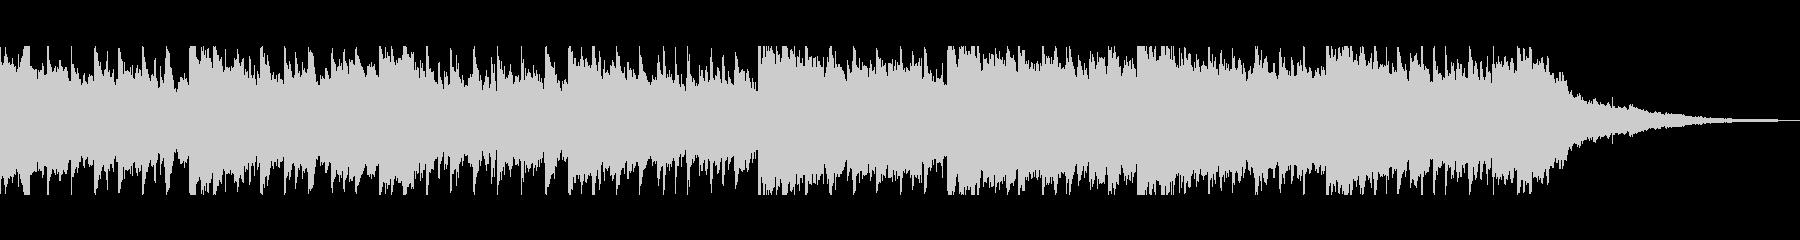 SNS動画広告向きピアノギター曲(短)の未再生の波形